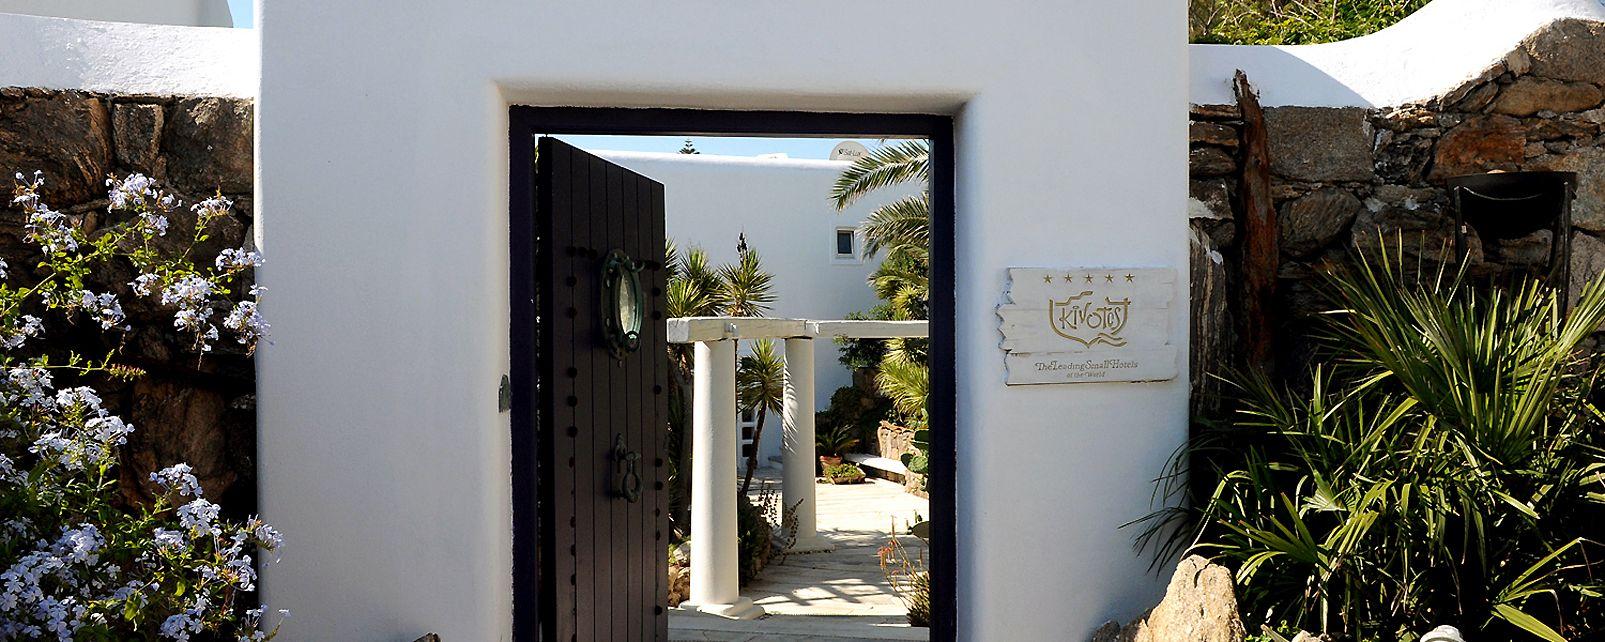 Hôtel Kivotos